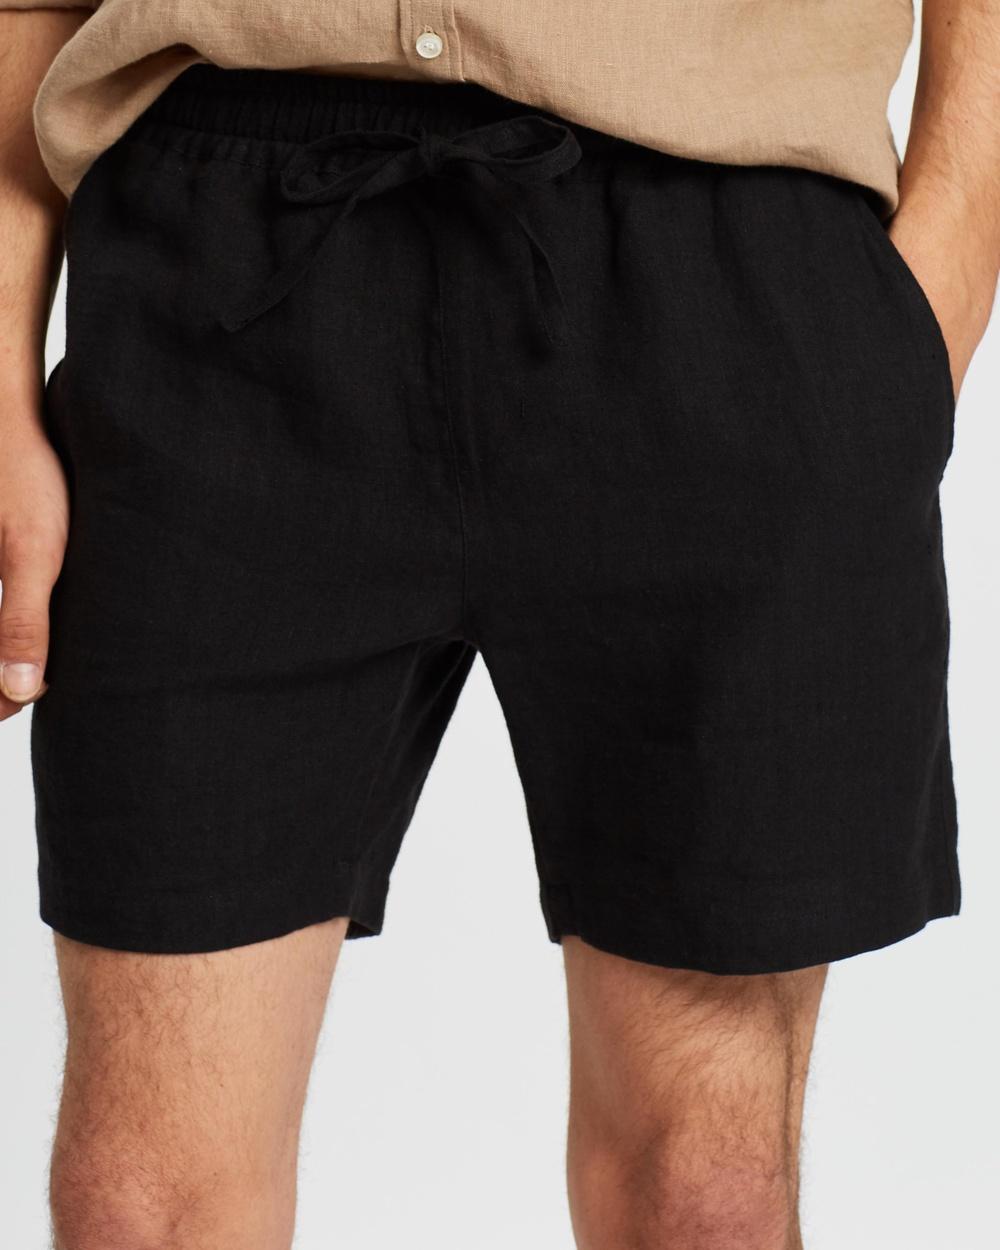 AERE Linen Pull On Shorts Black